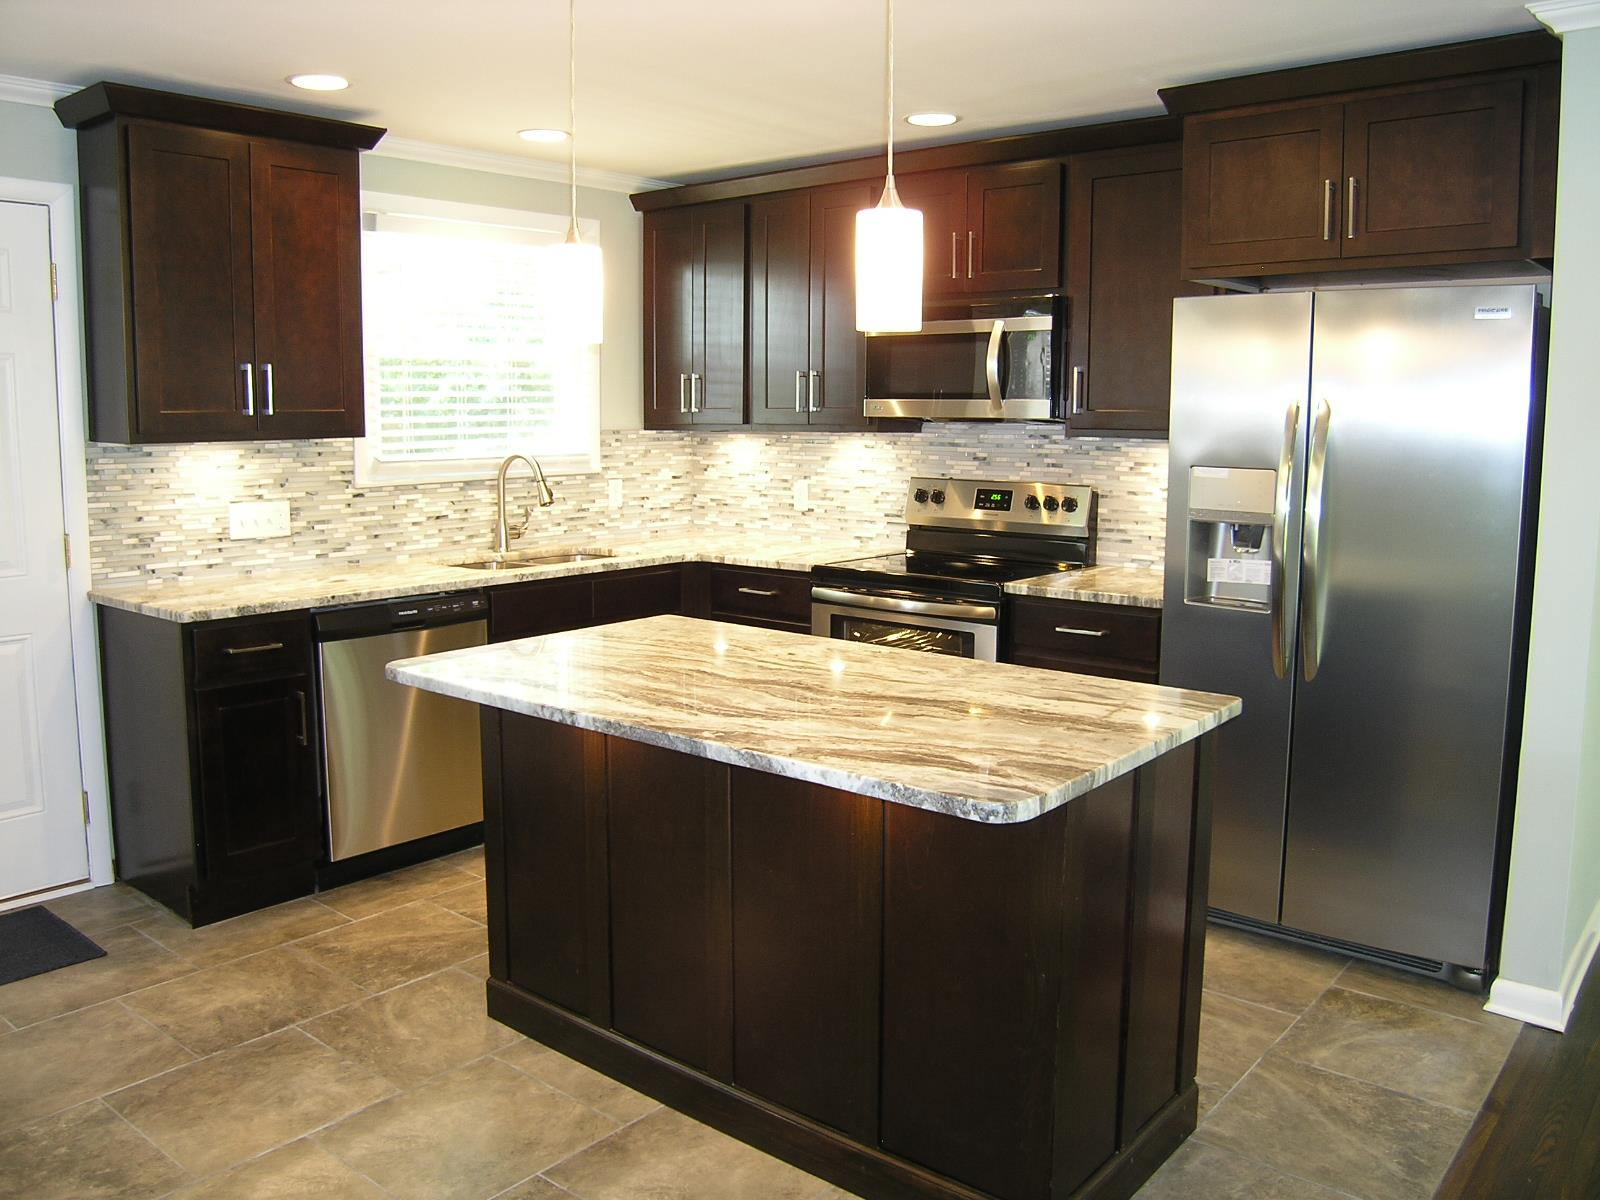 3054 HILLSIDE RD, Nashville, TN 37207 - Nashville, TN real estate listing